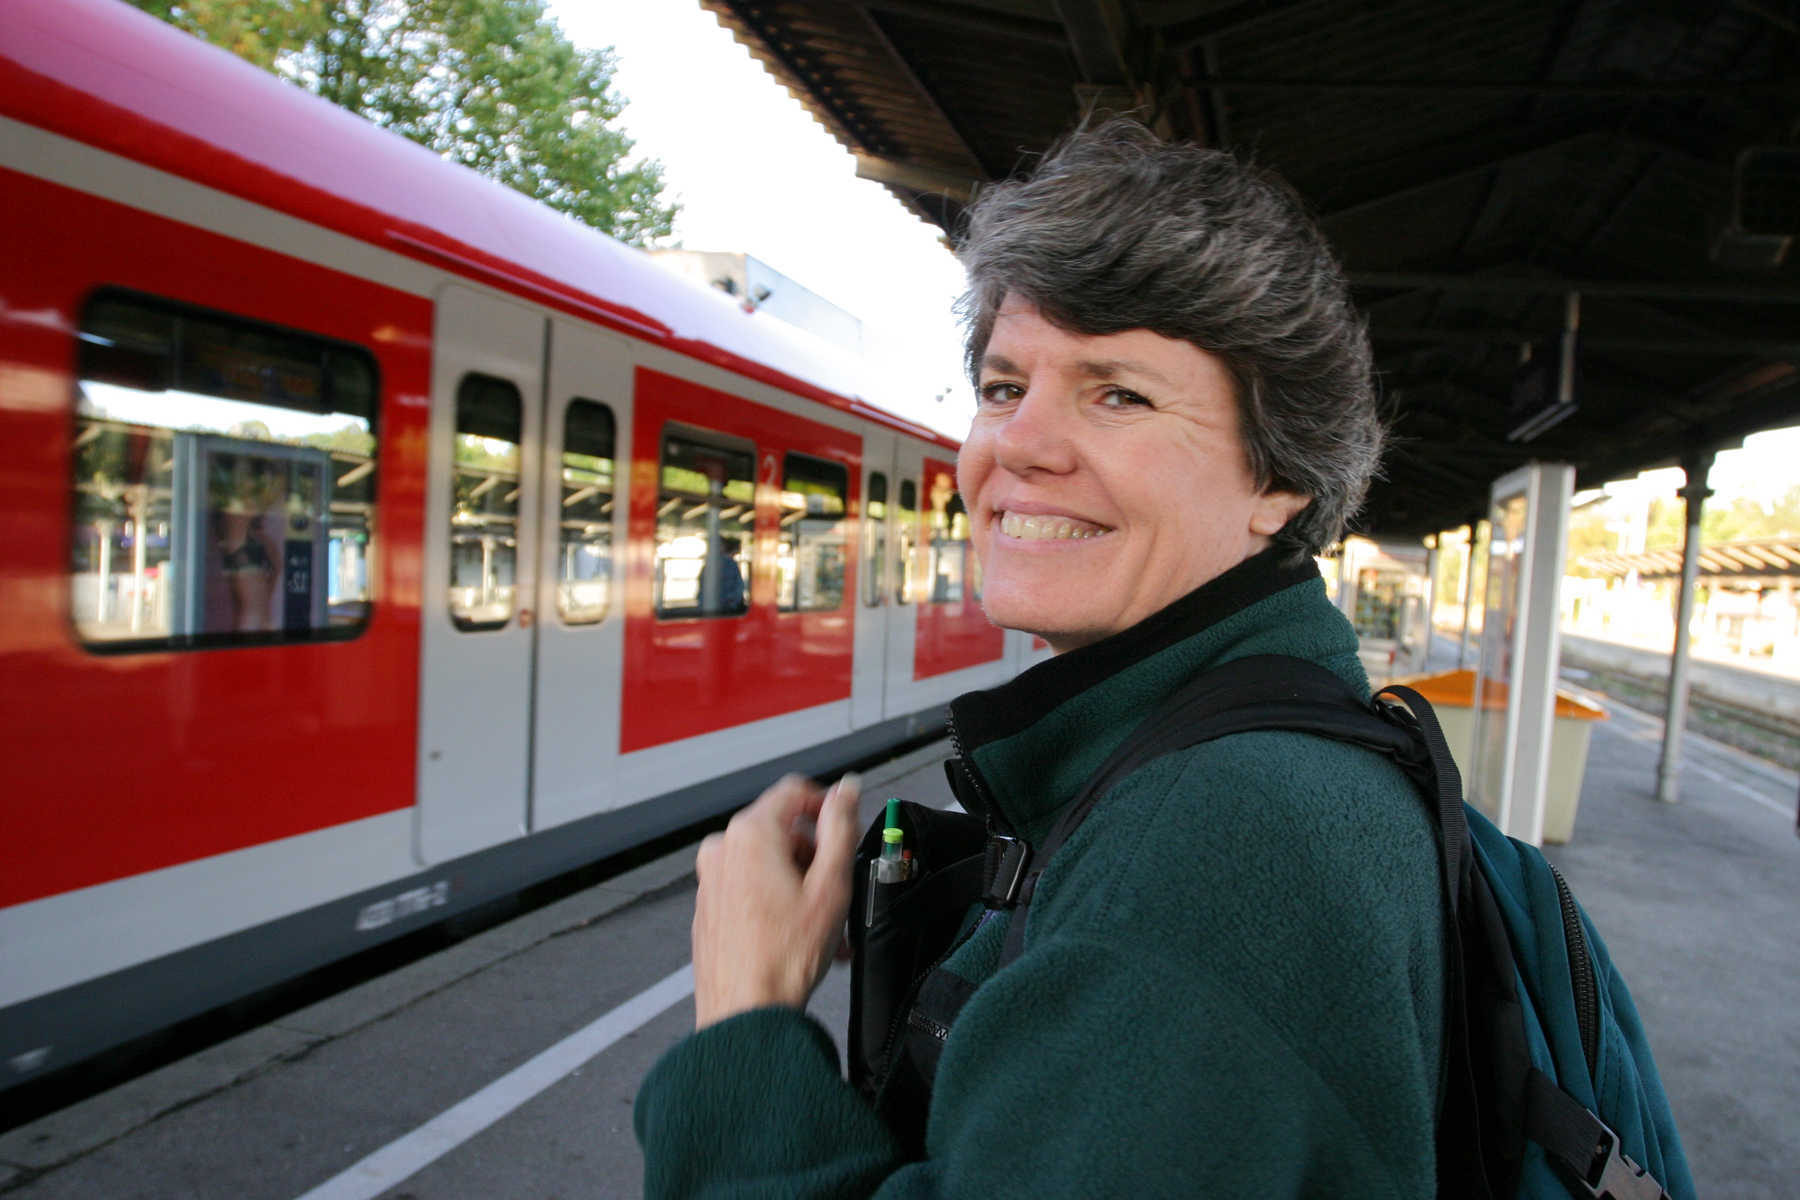 Woman Traveler in Train Station